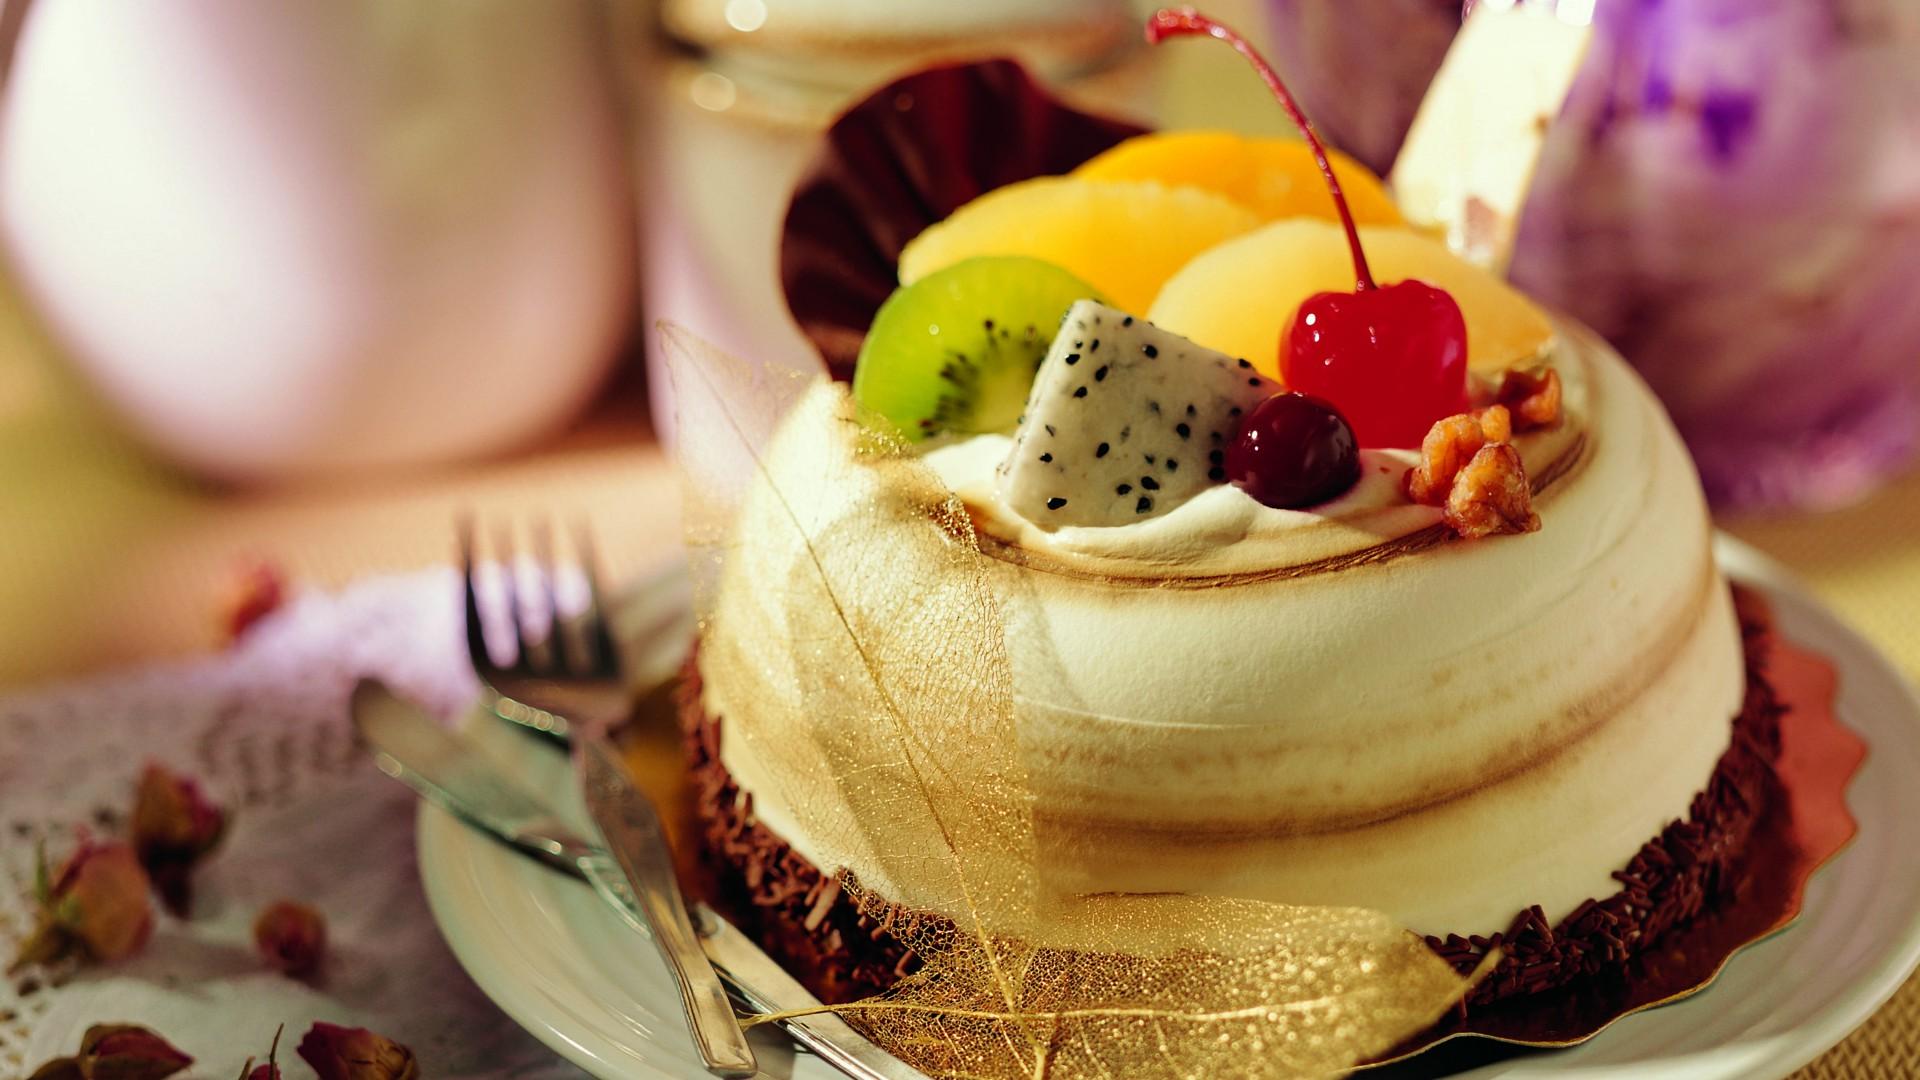 ... Wallpaper, Food / Desserts: Cake, souffle, fruits, cherry, chocolate